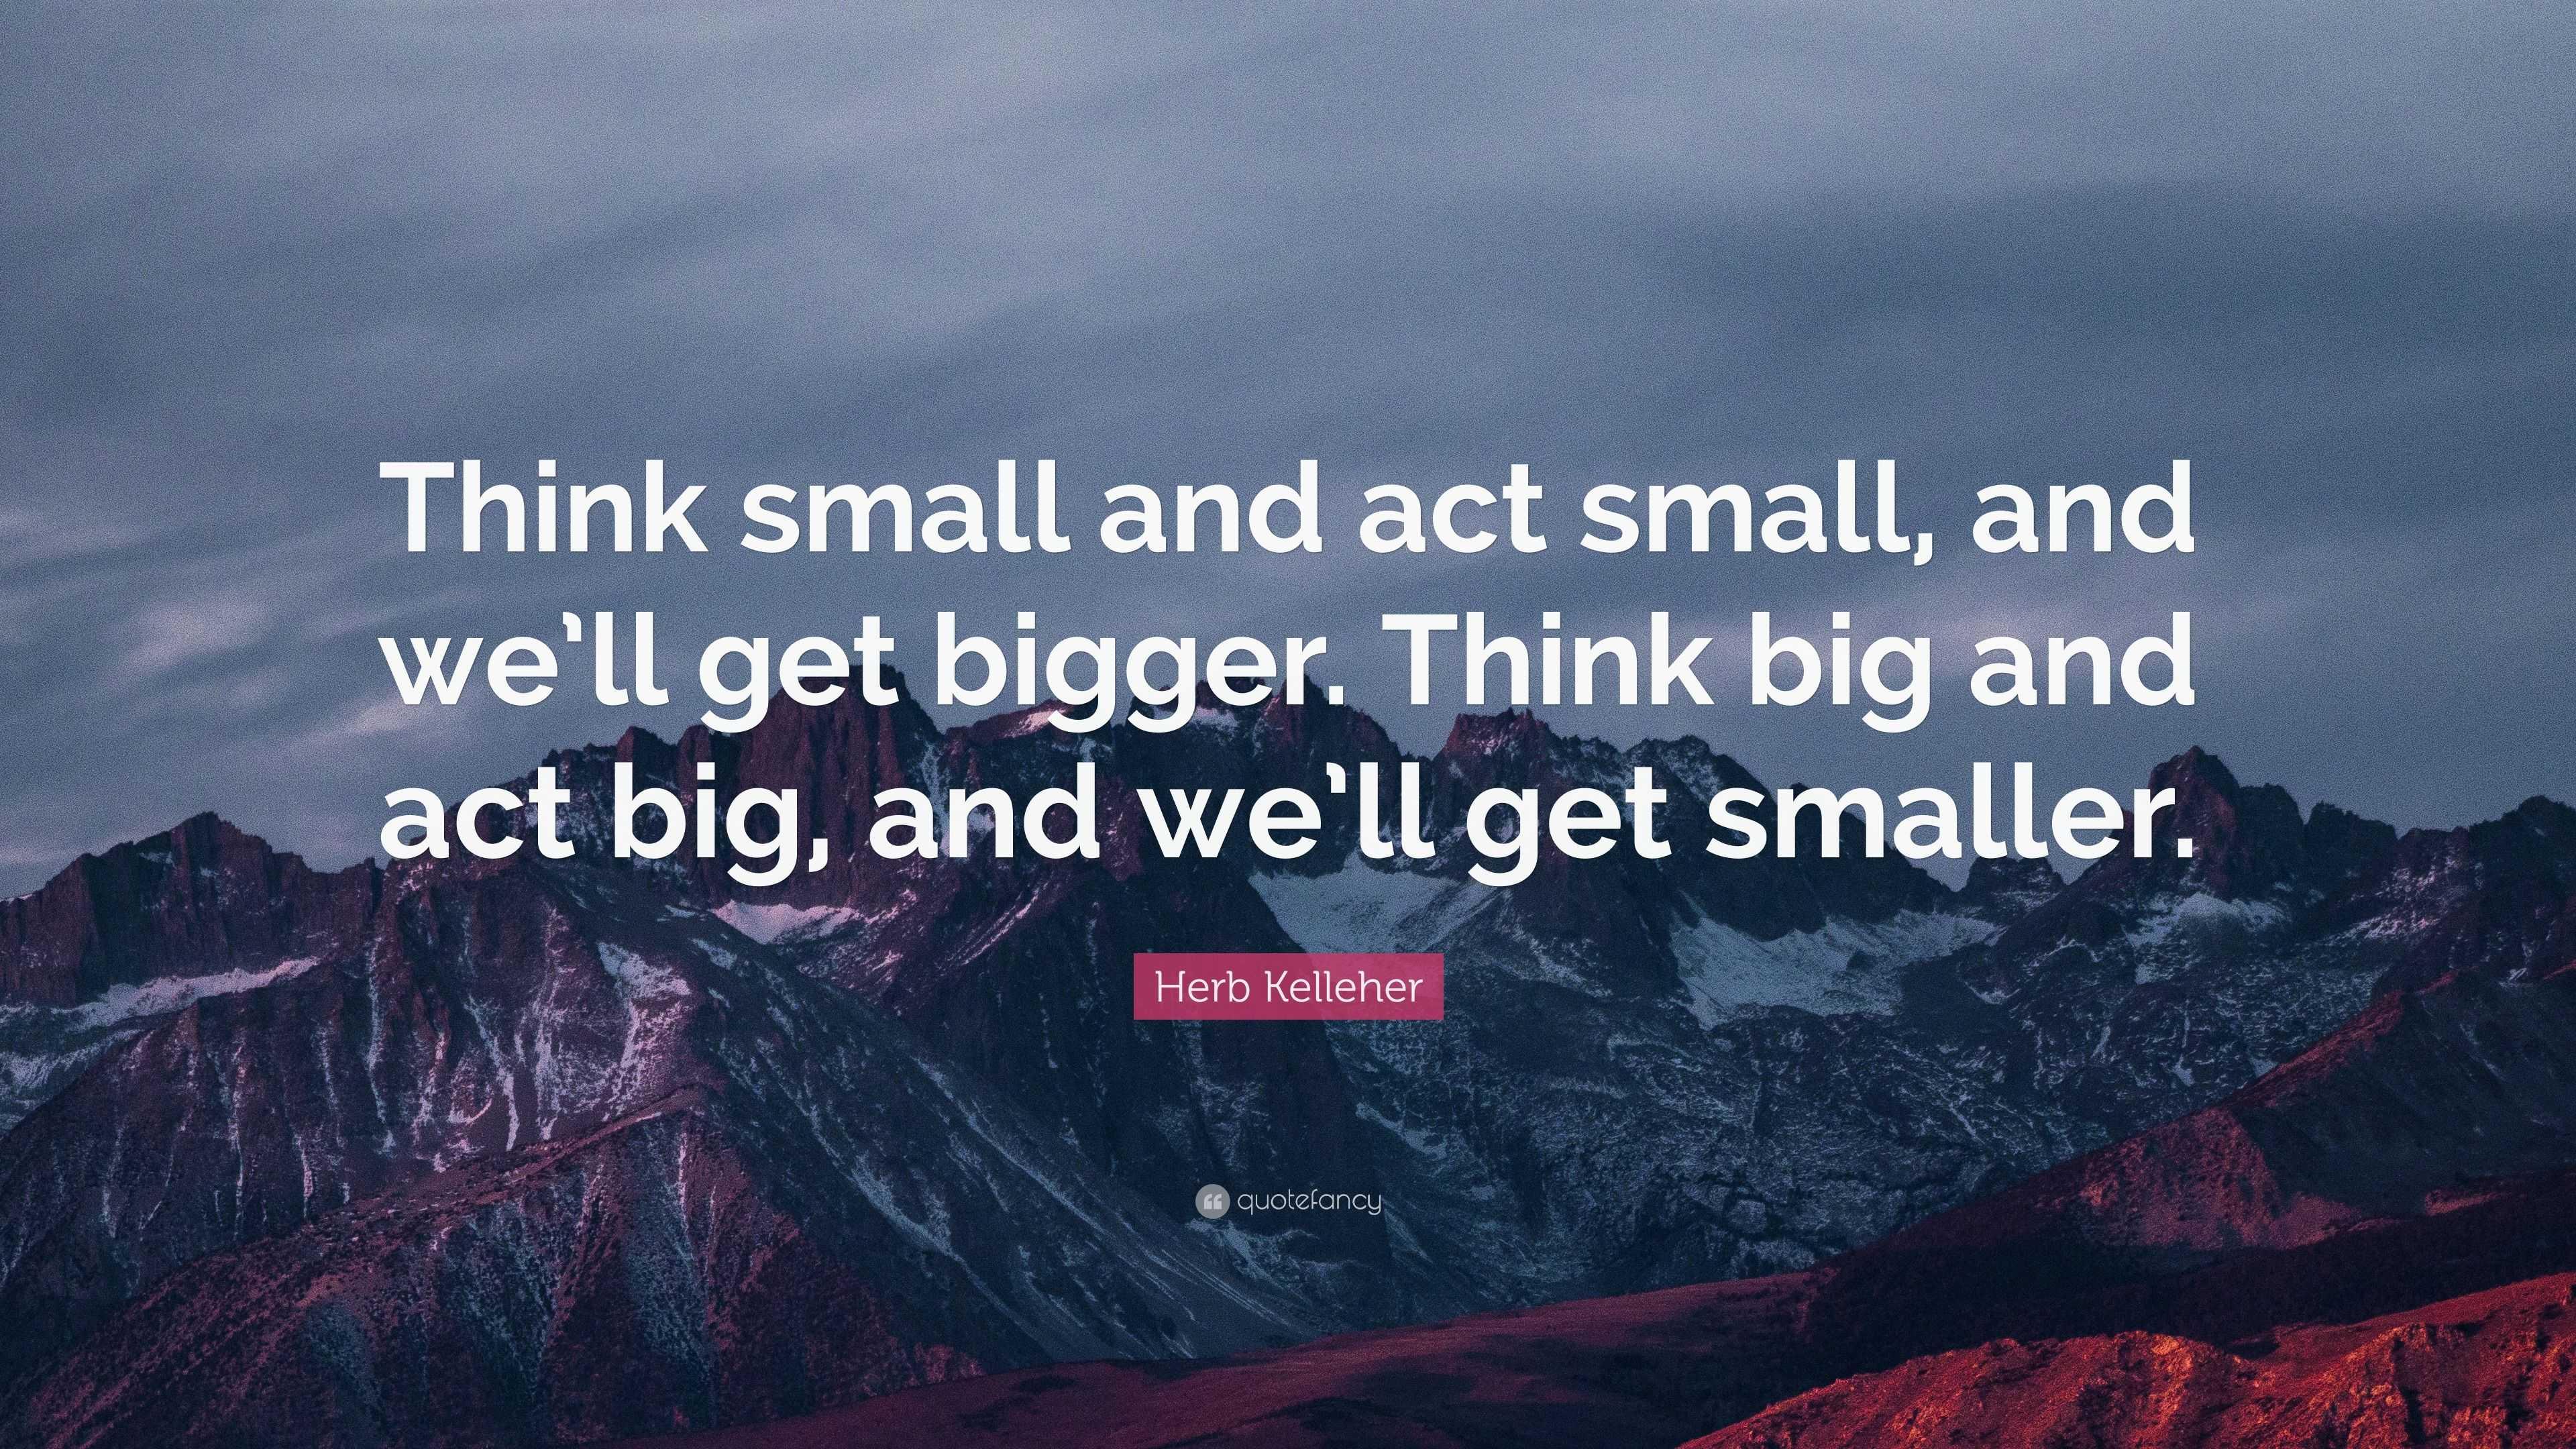 Big Things Quotes | Big Things Sayings | Big Things ...  |Get Big Quotes